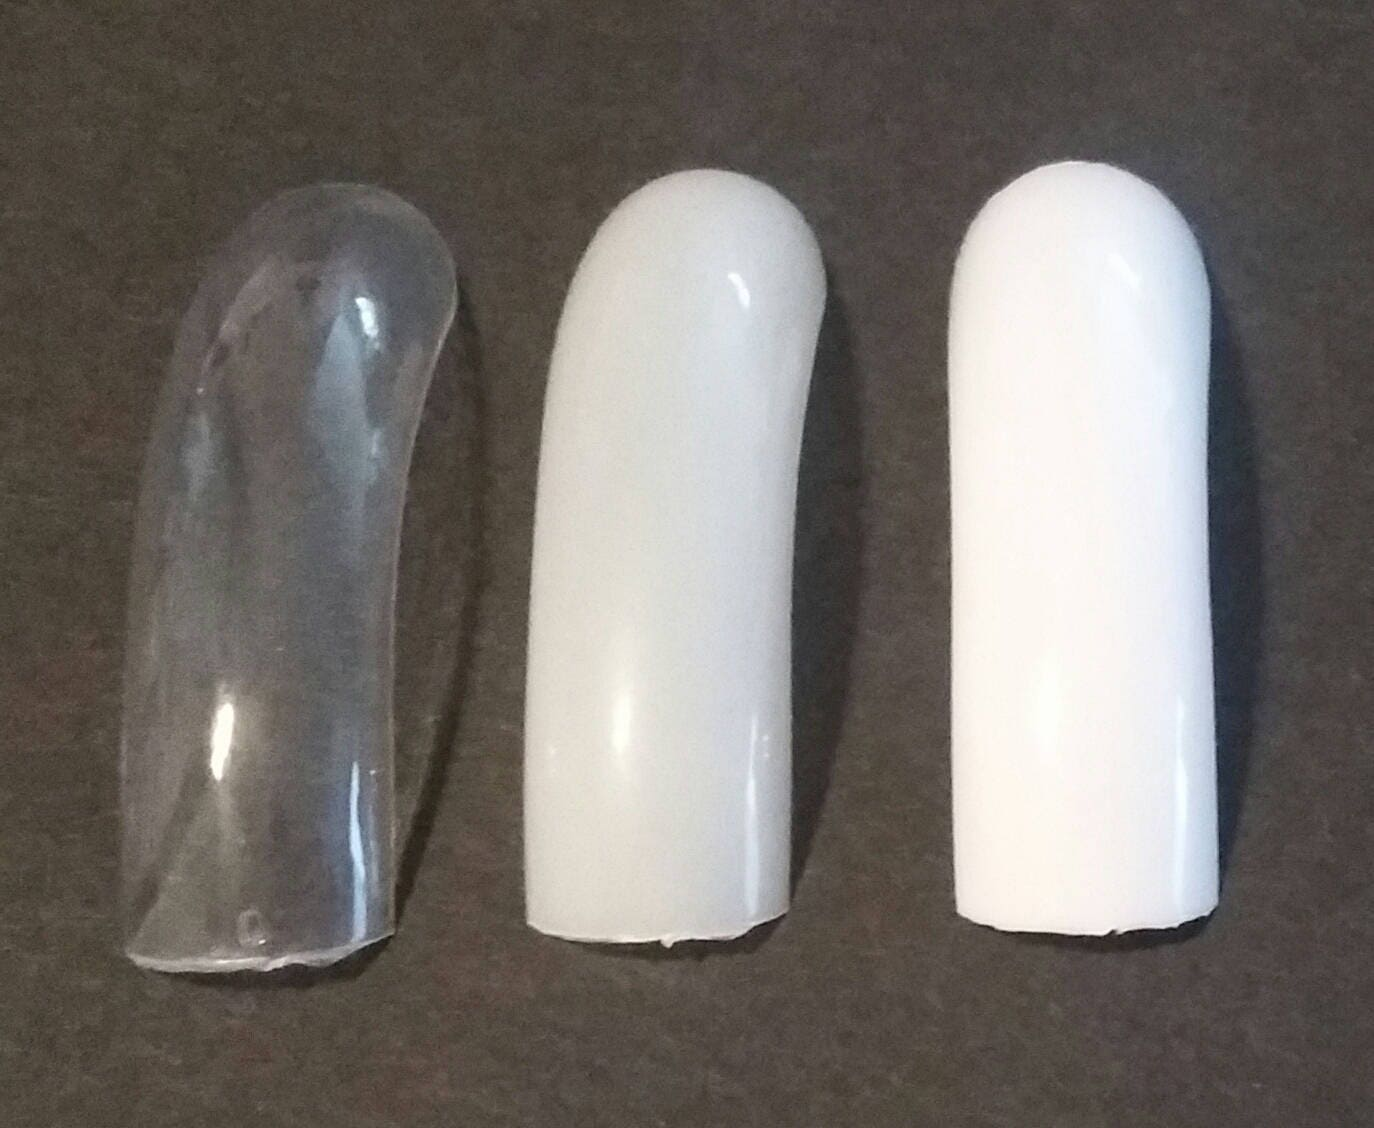 DIY Artificial EXTRA LONG Empress Curve Square Nails | Full Cover ...